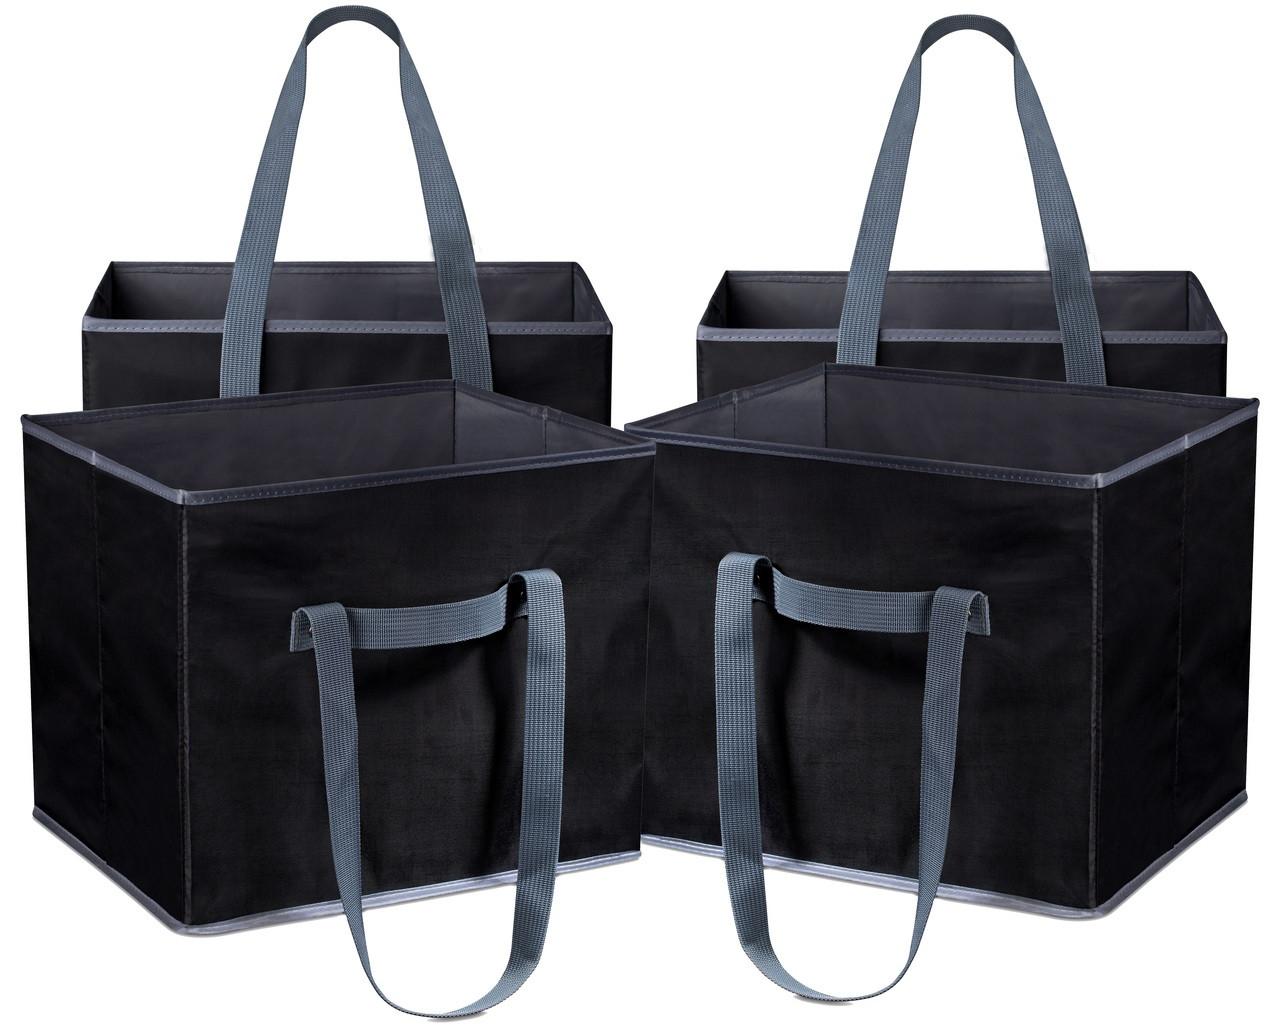 b8138efe1f Reusable Shopping Cube Grocery Bag